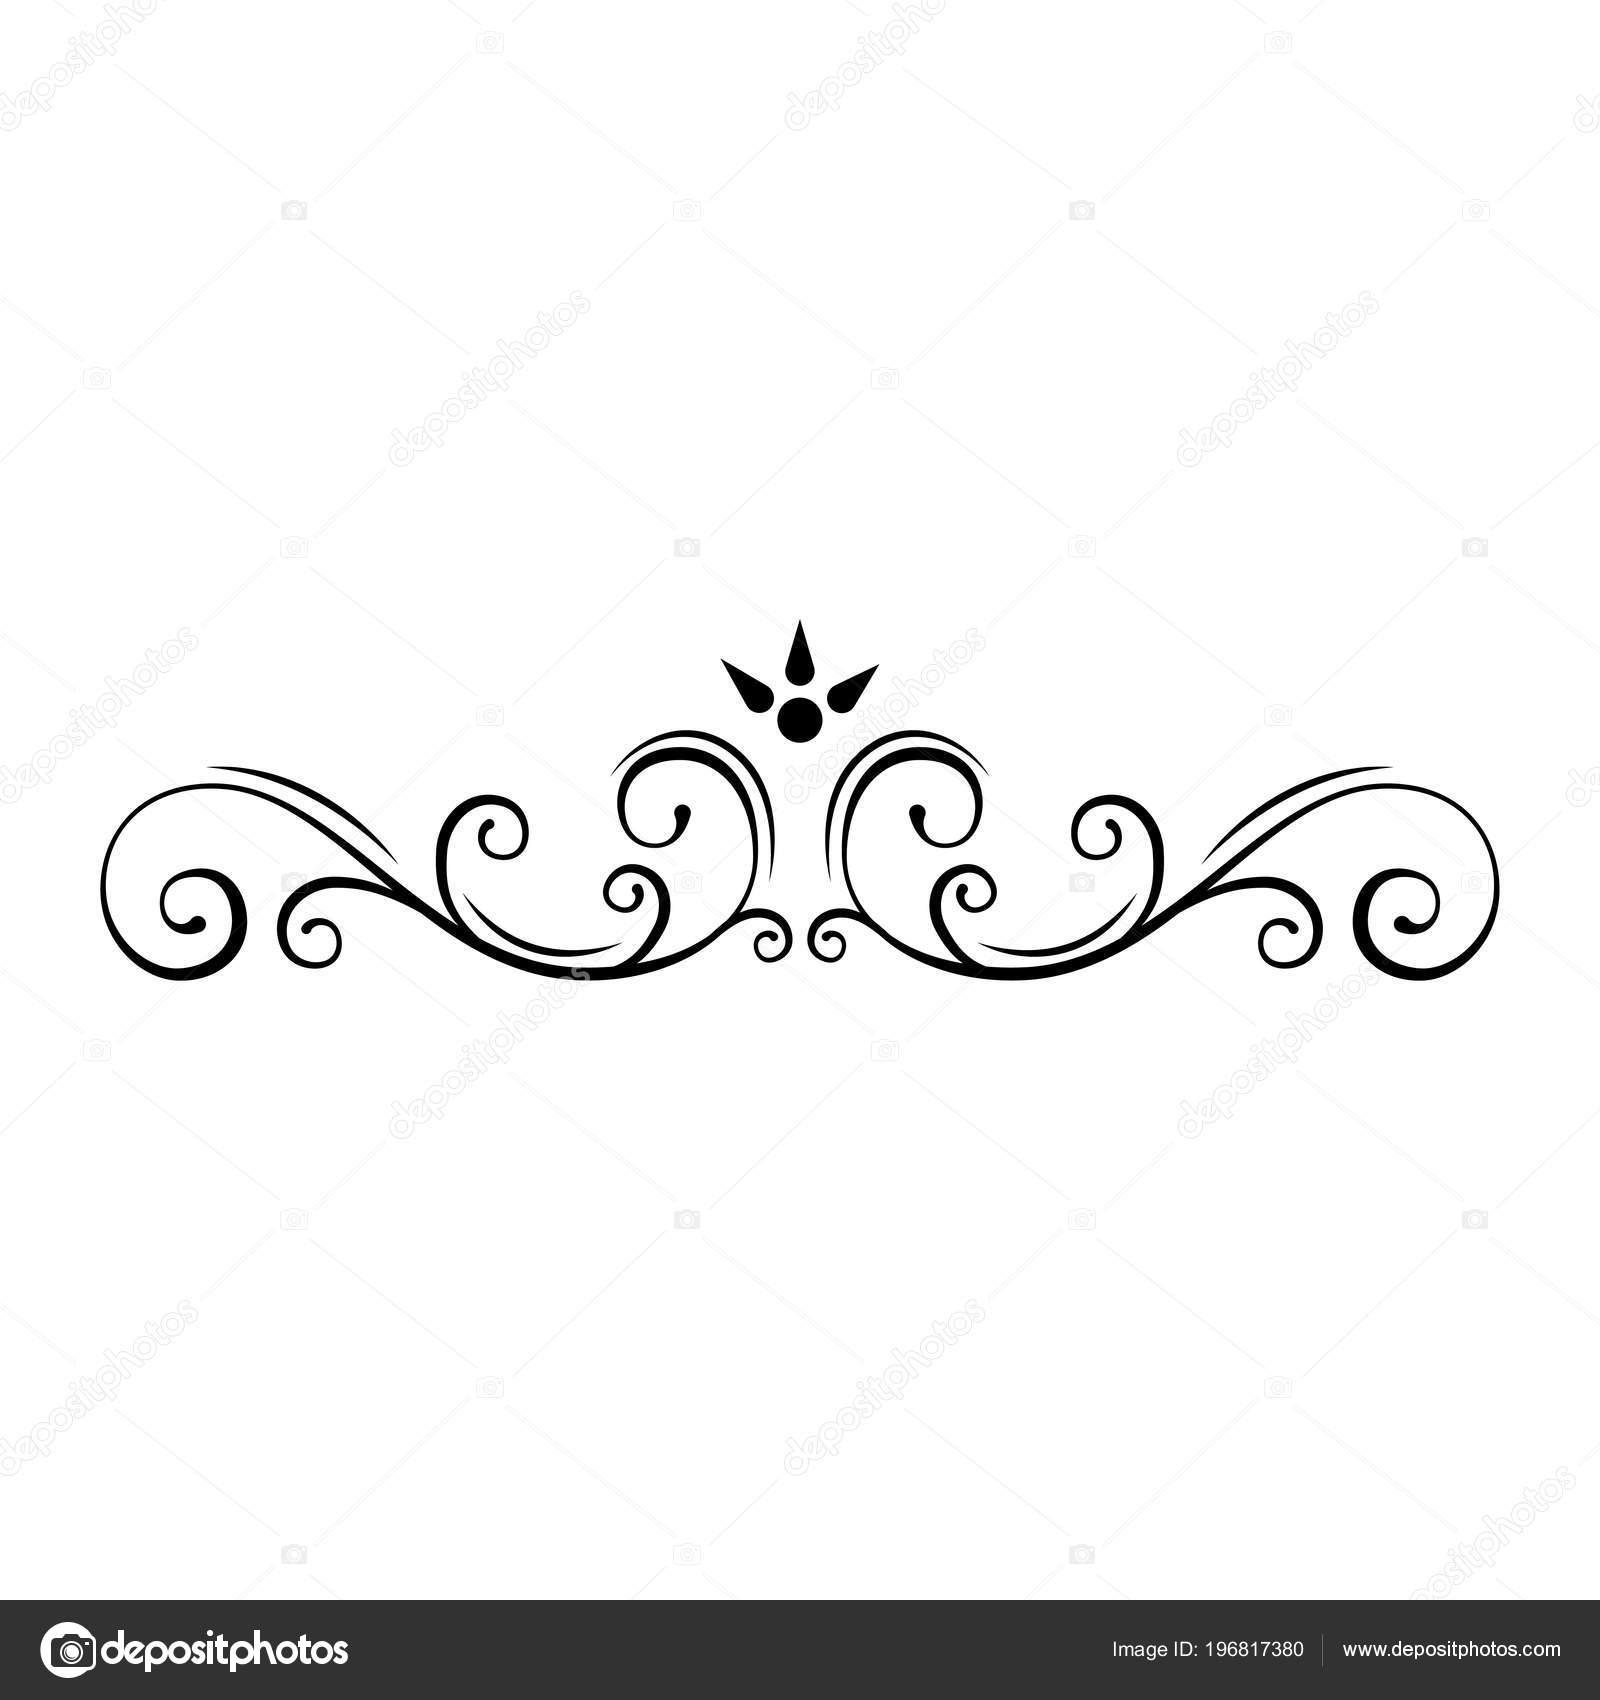 Callirgaphic flourish scroll design element. Wedding invitation, Greeting card, Save the date card. Vector illustration.